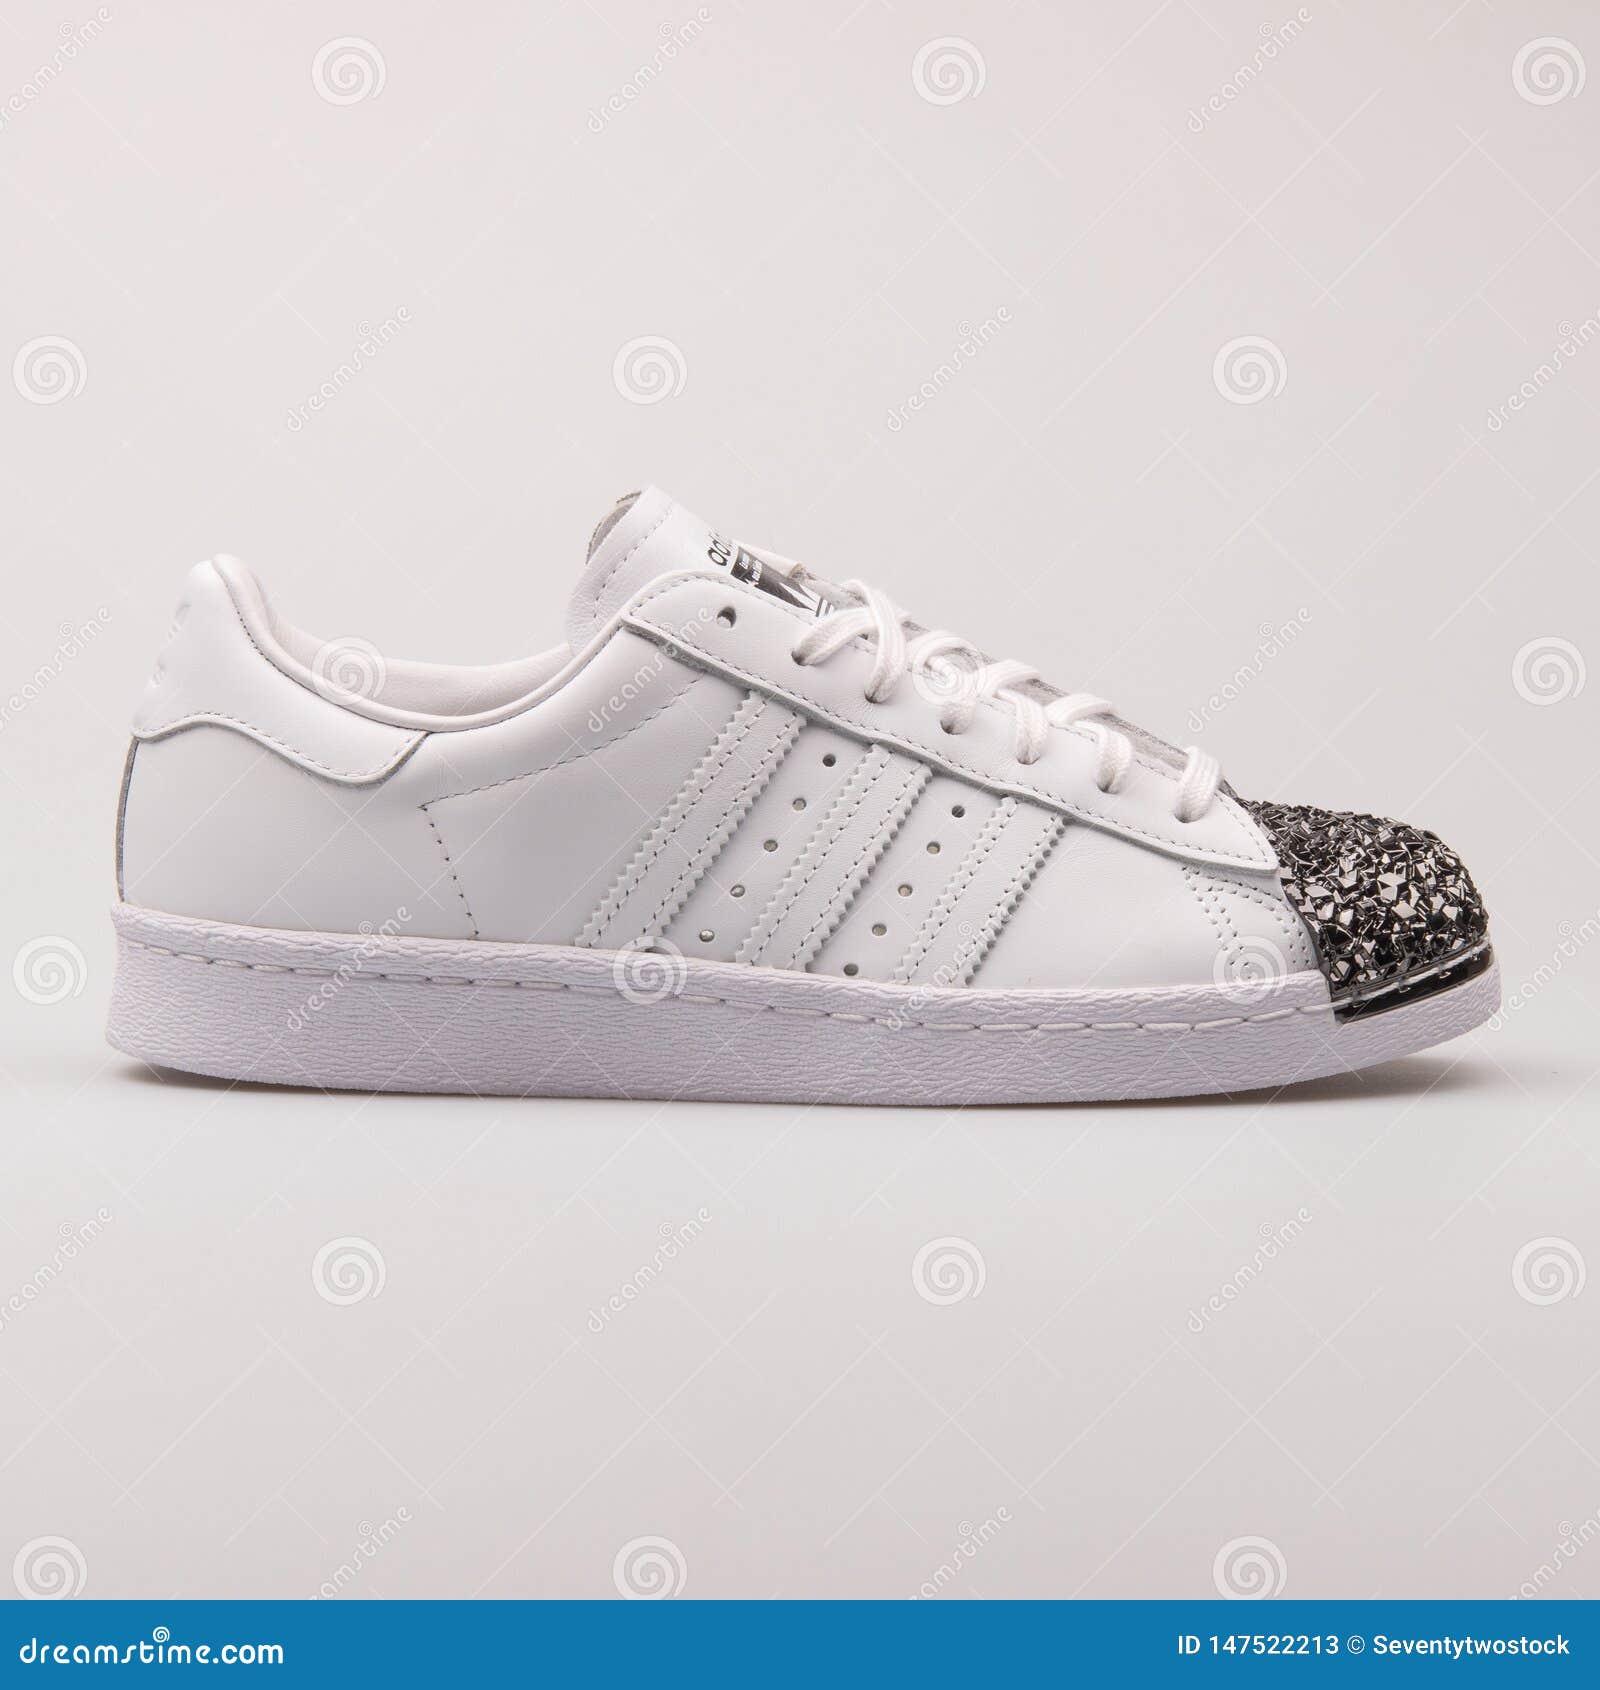 Restricción mar Mediterráneo batalla  Adidas Superstar 80s Metal Toe White Sneaker Editorial Stock Photo - Image  of exercise, fitness: 147522213